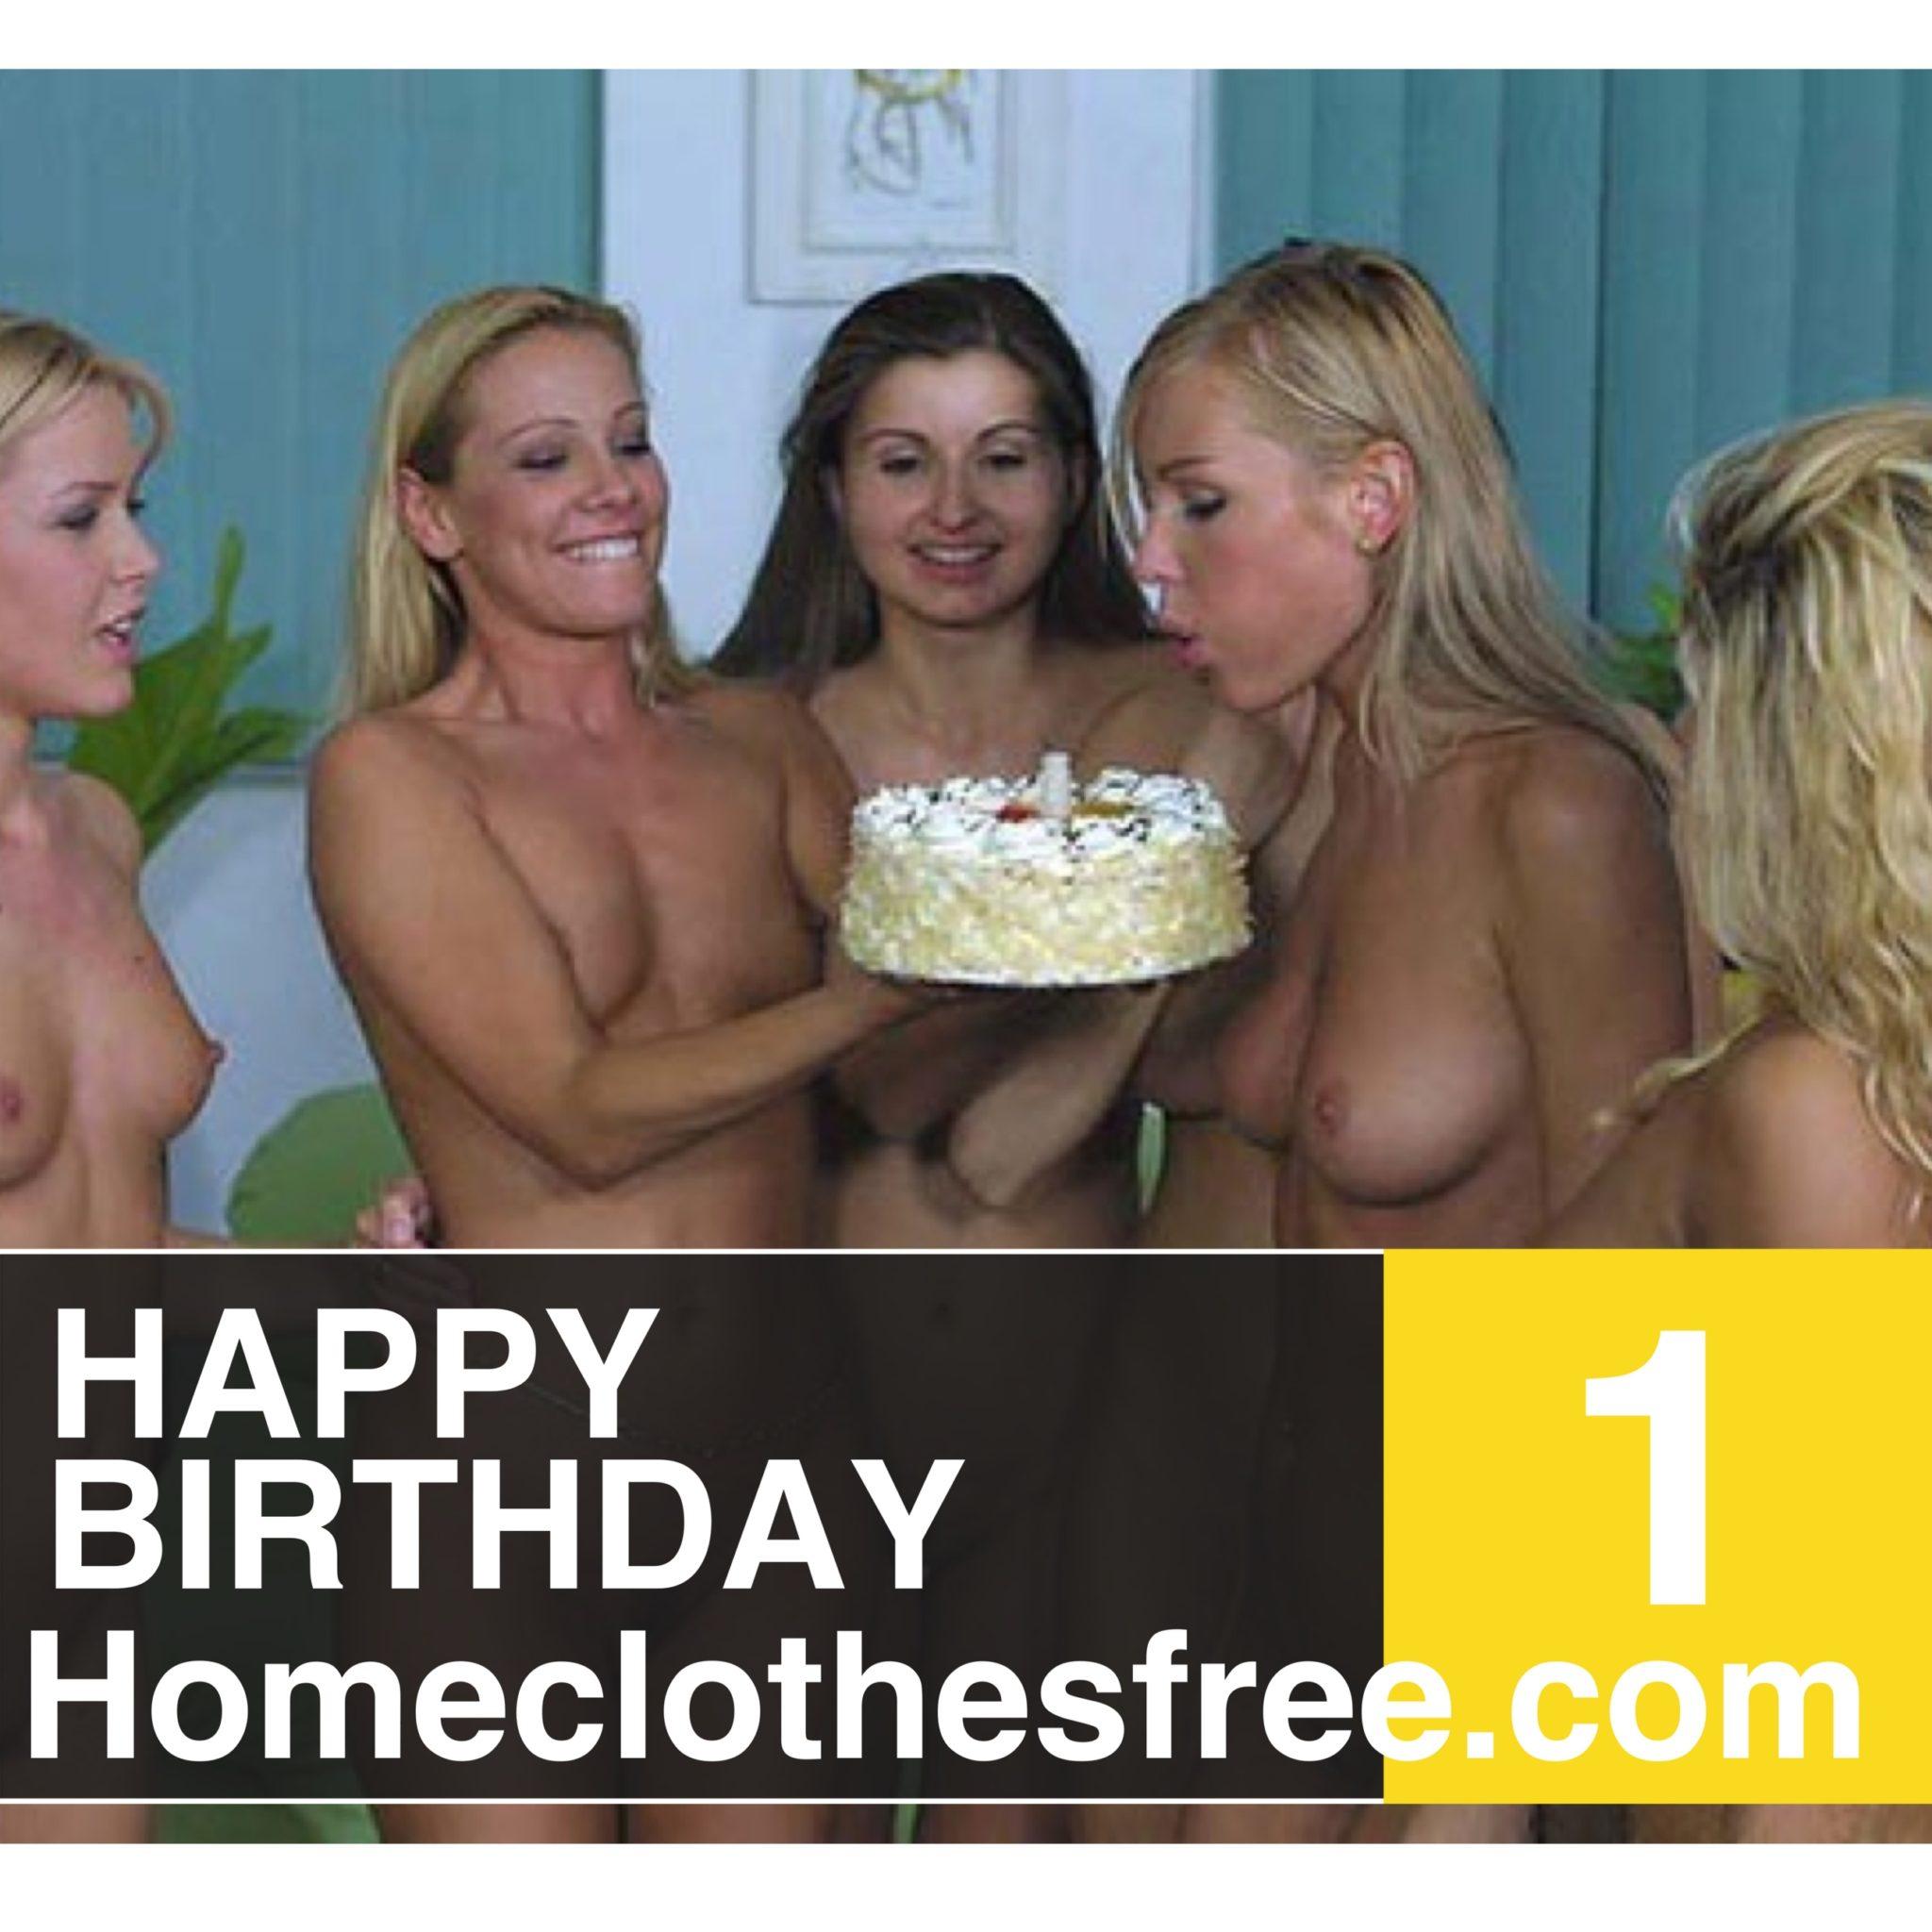 happy Birthday Homeclothesfree.com